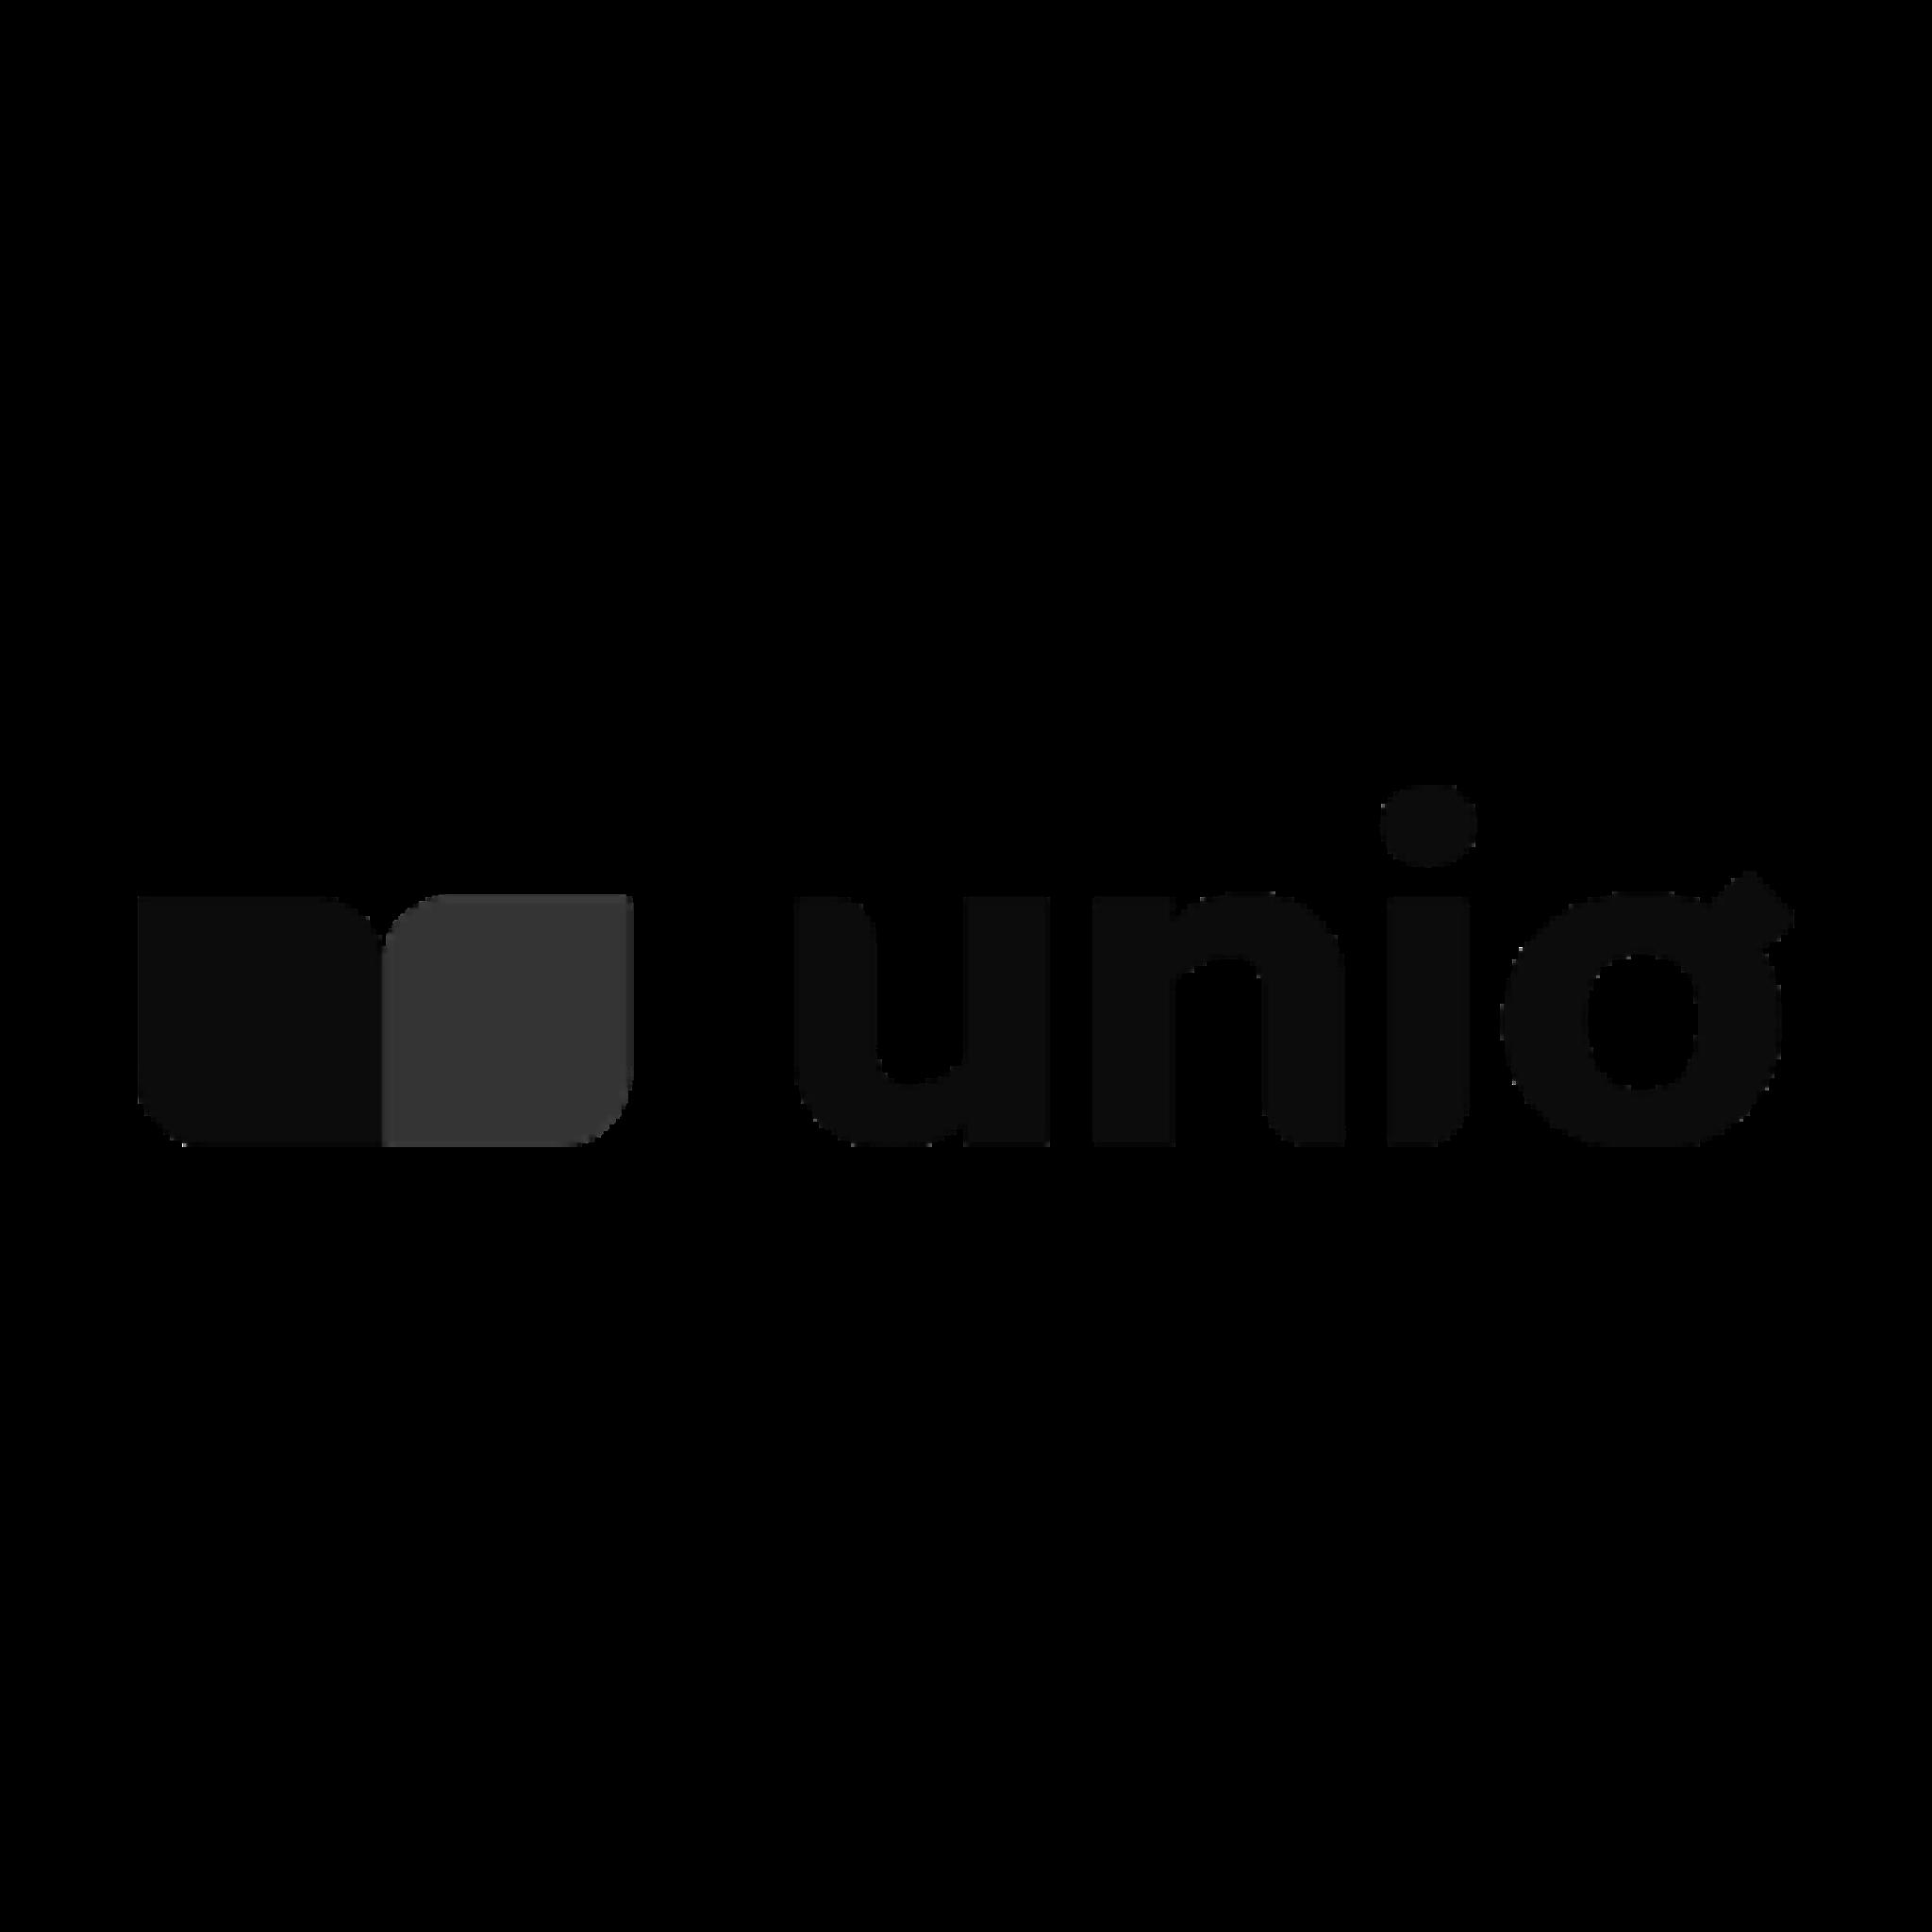 LOGO-Unio-1x1-transp